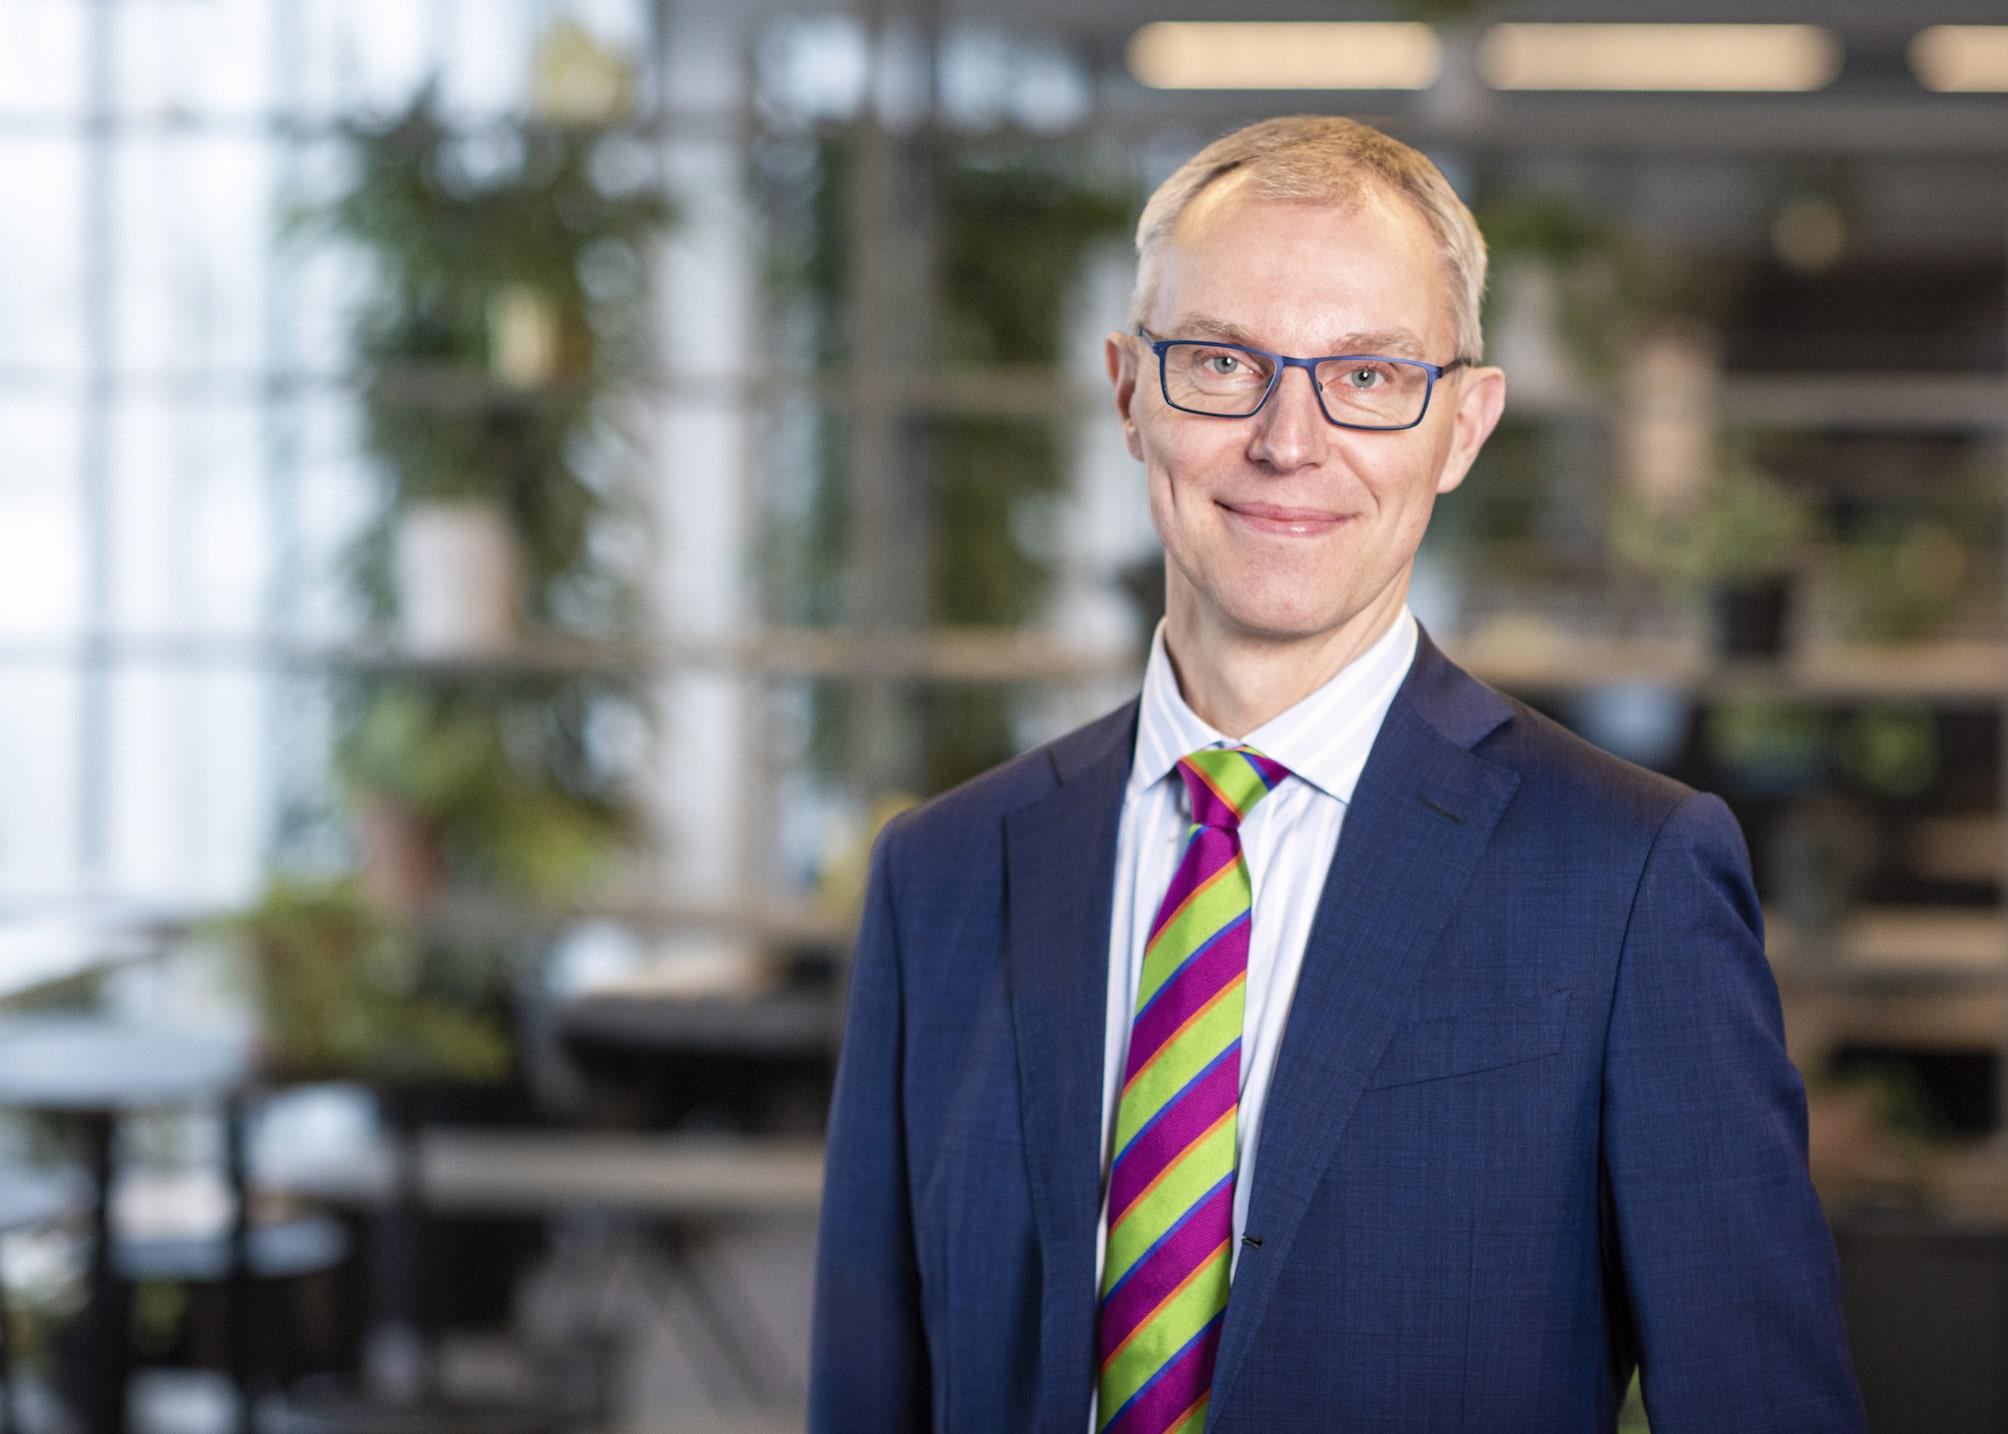 Den erfarne hotelier, Peter Møller Laursen, har nærmest blåt blod i årene efter en solid karriere hos Radisson Blu Hotels. Den 1. februar lander han i Aarhus Airport som kommerciel chef. (PR-foto: Kirsten Adler)